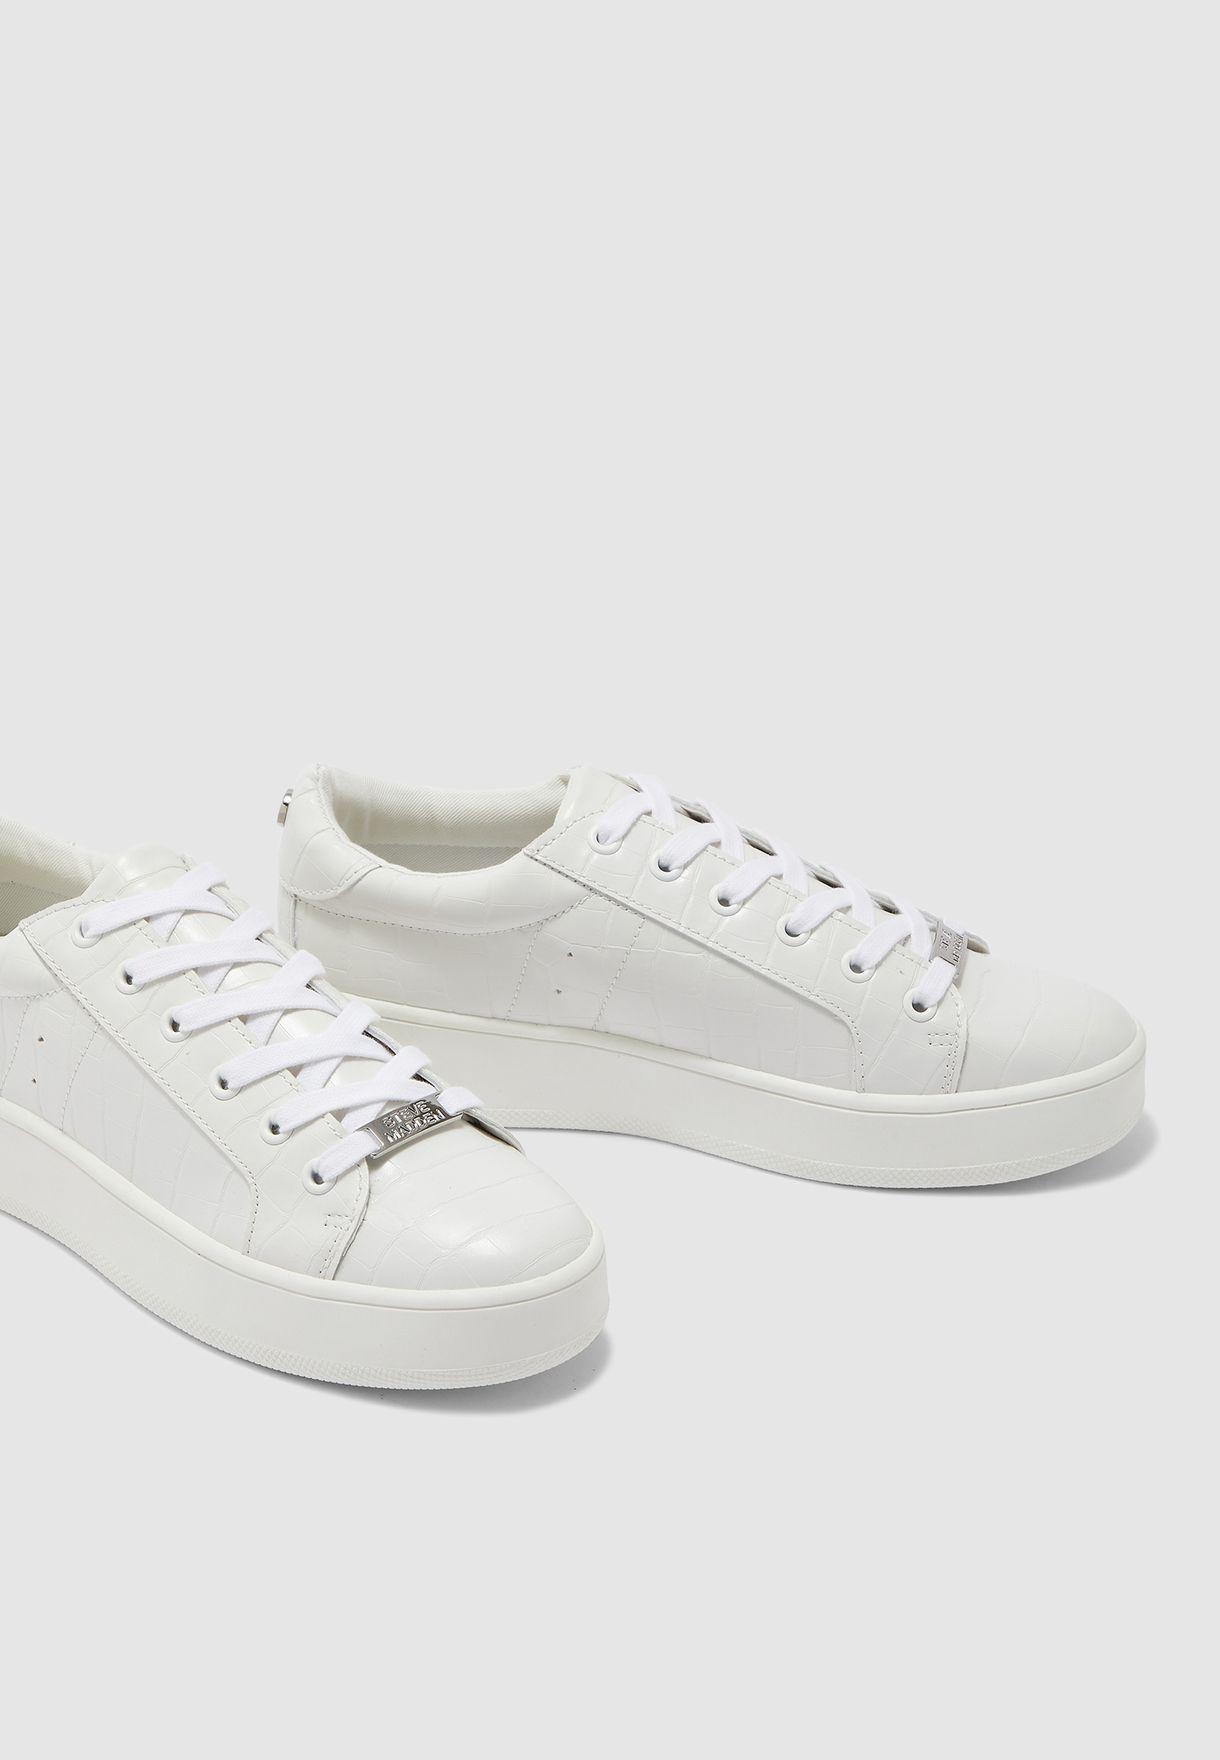 Bertie Low Top Sneaker - White